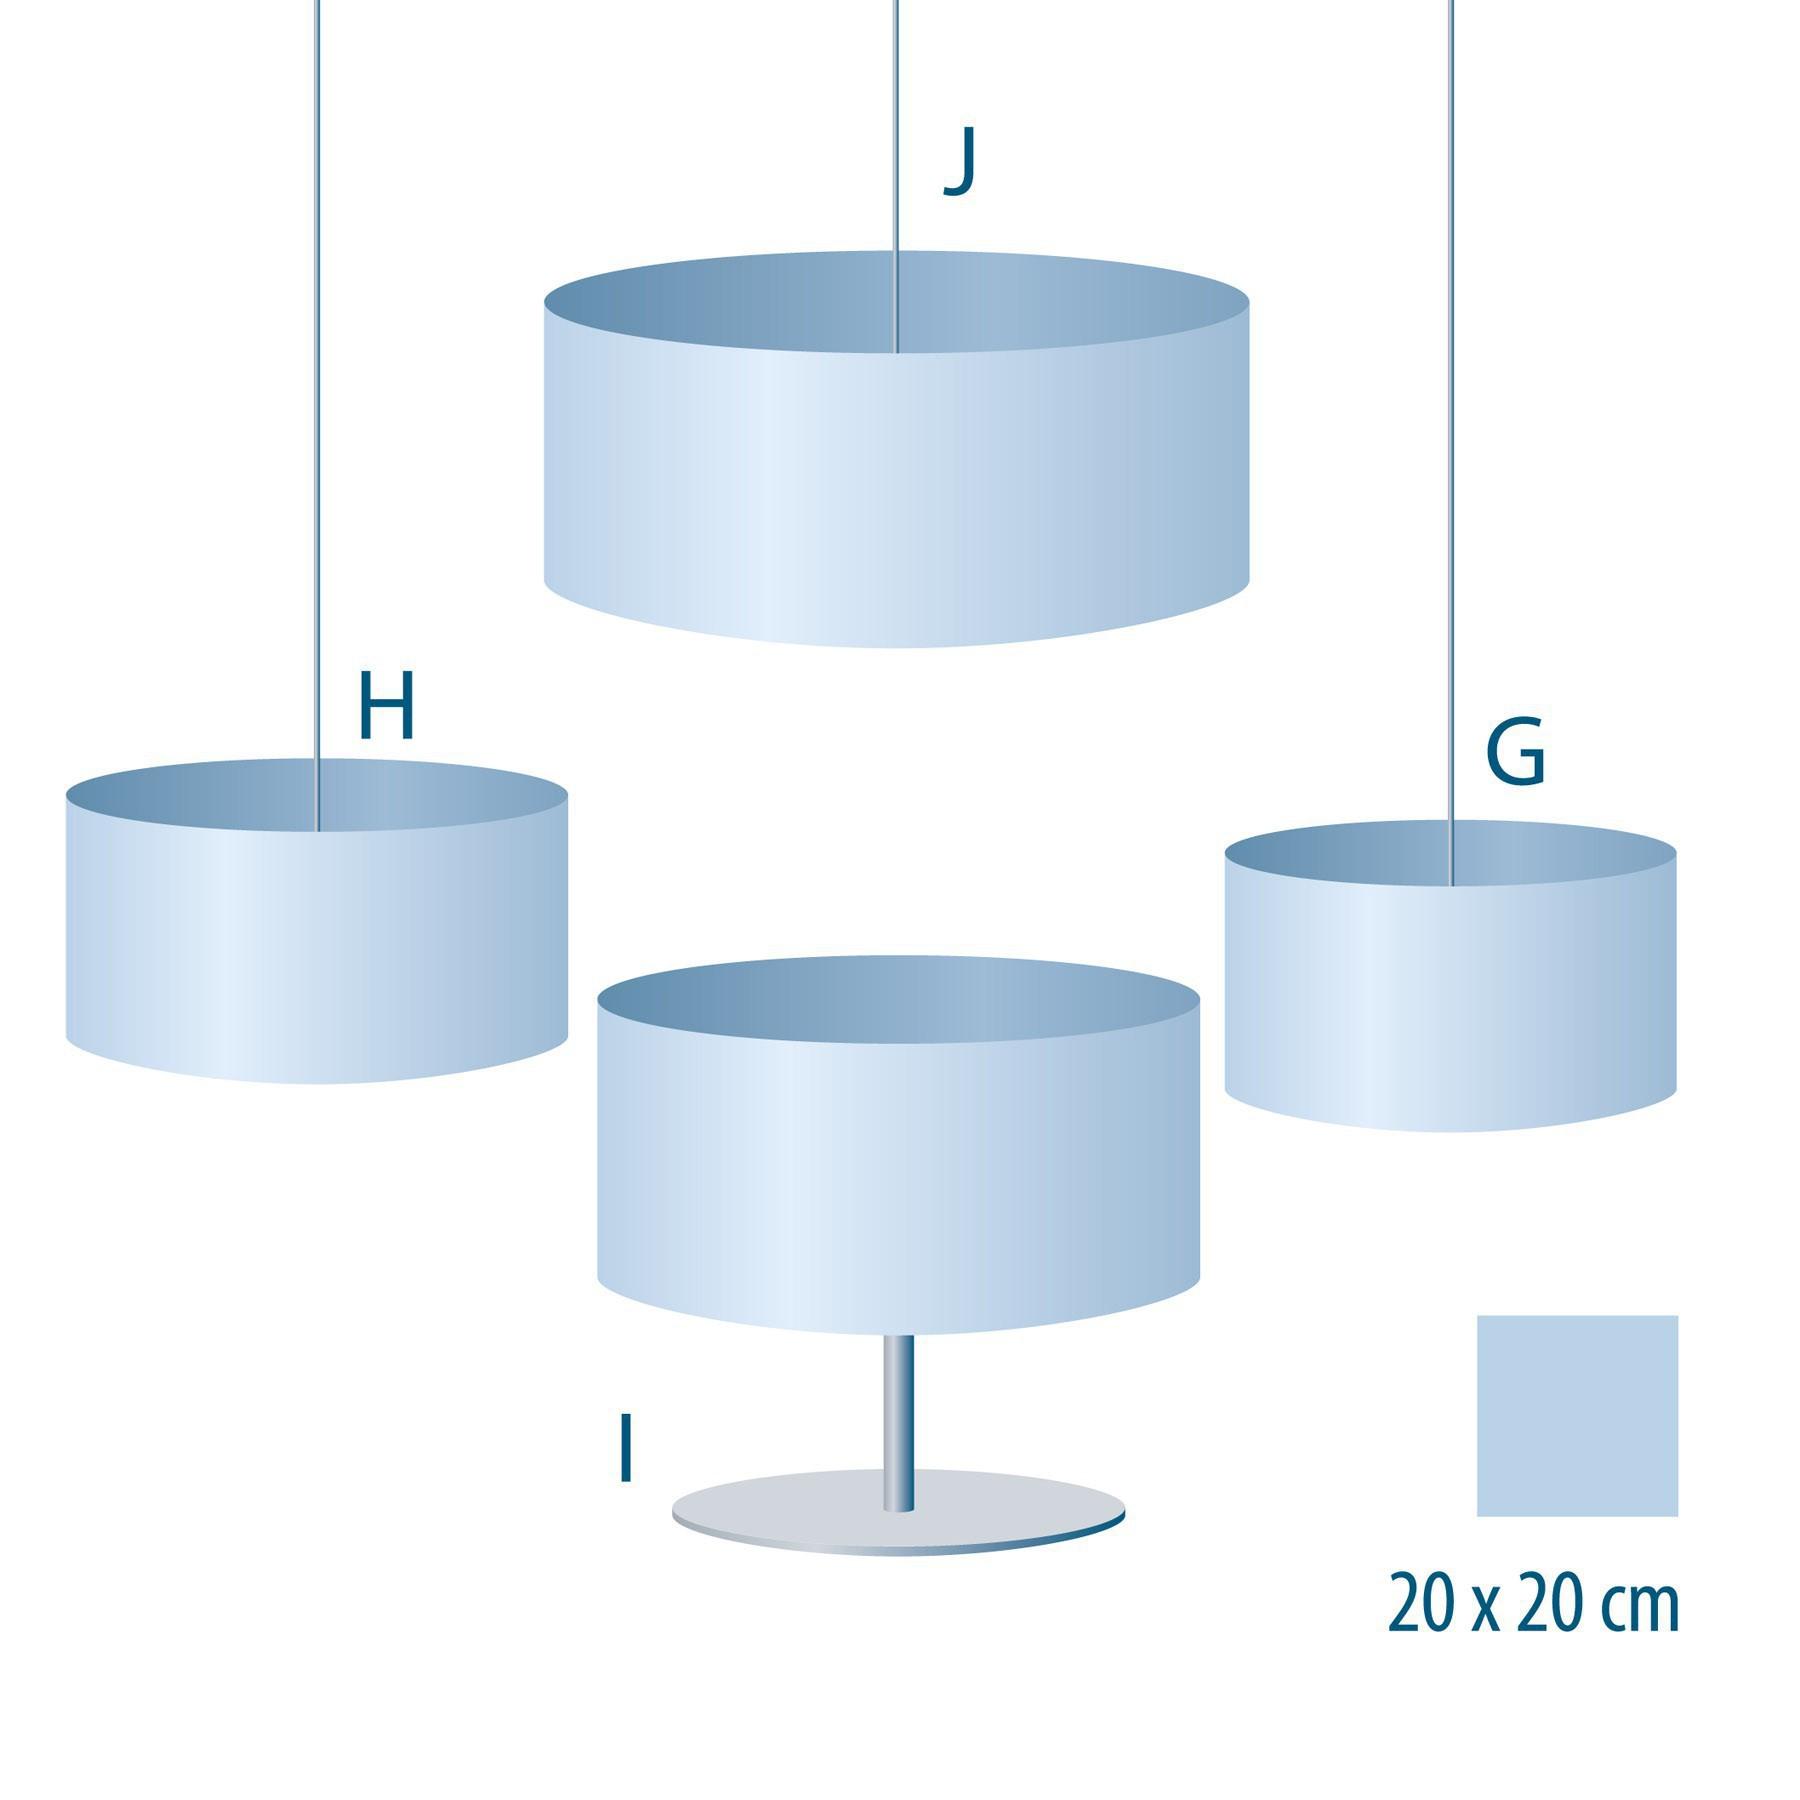 stoff lampenschirm k fer wei auf blau. Black Bedroom Furniture Sets. Home Design Ideas